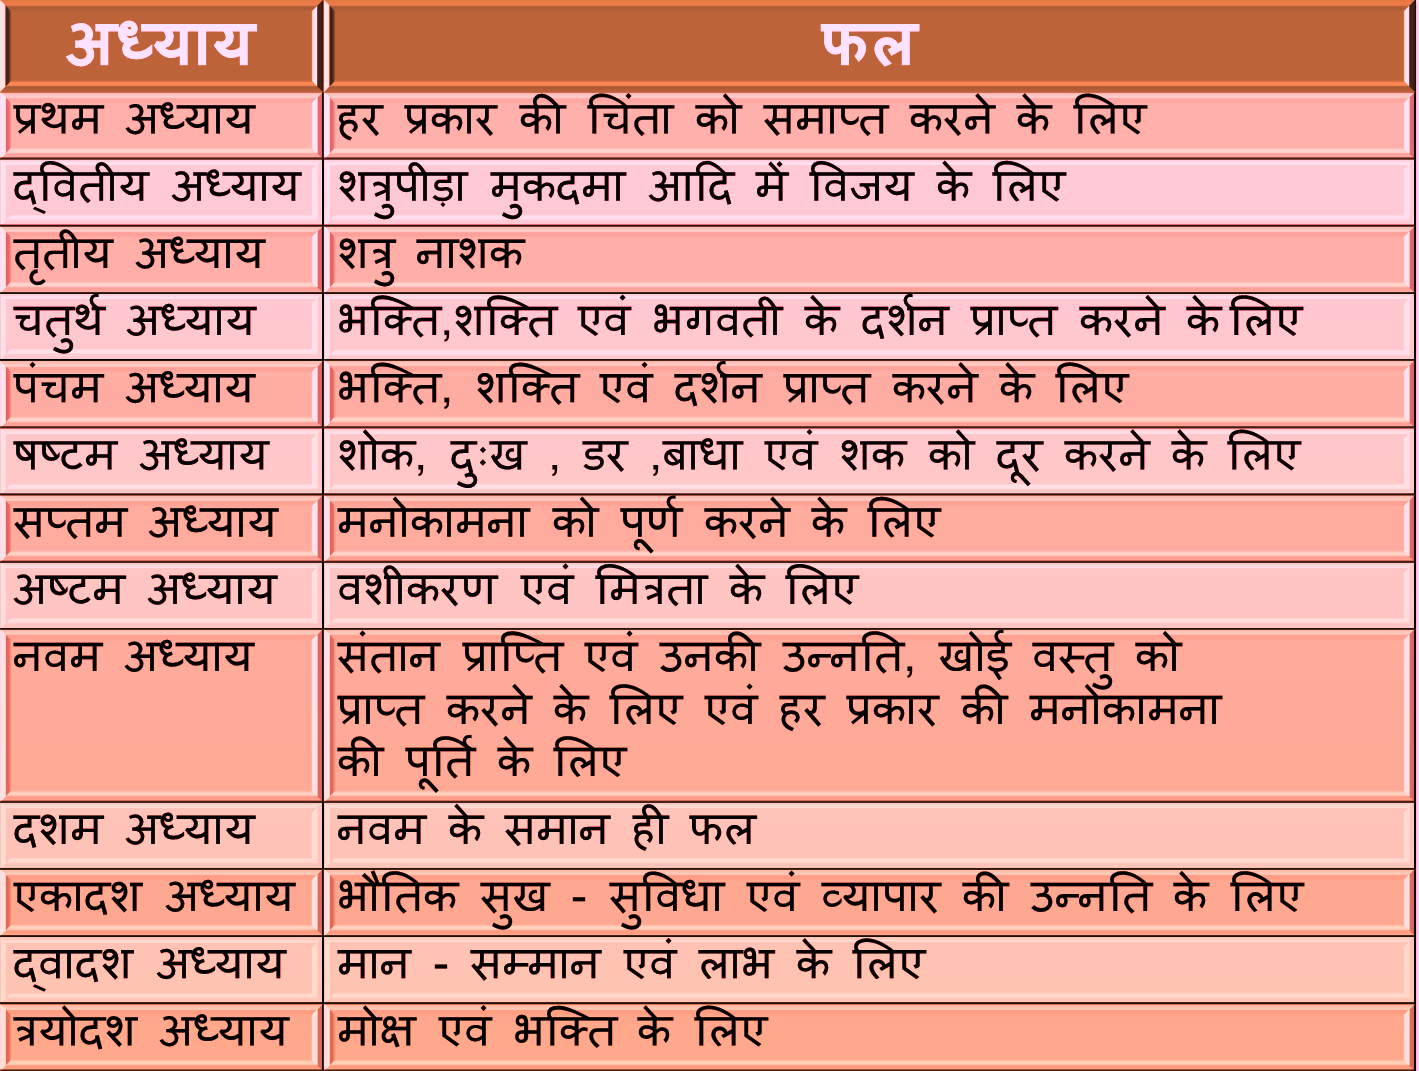 Free download durga stuti mp3 in hindi.